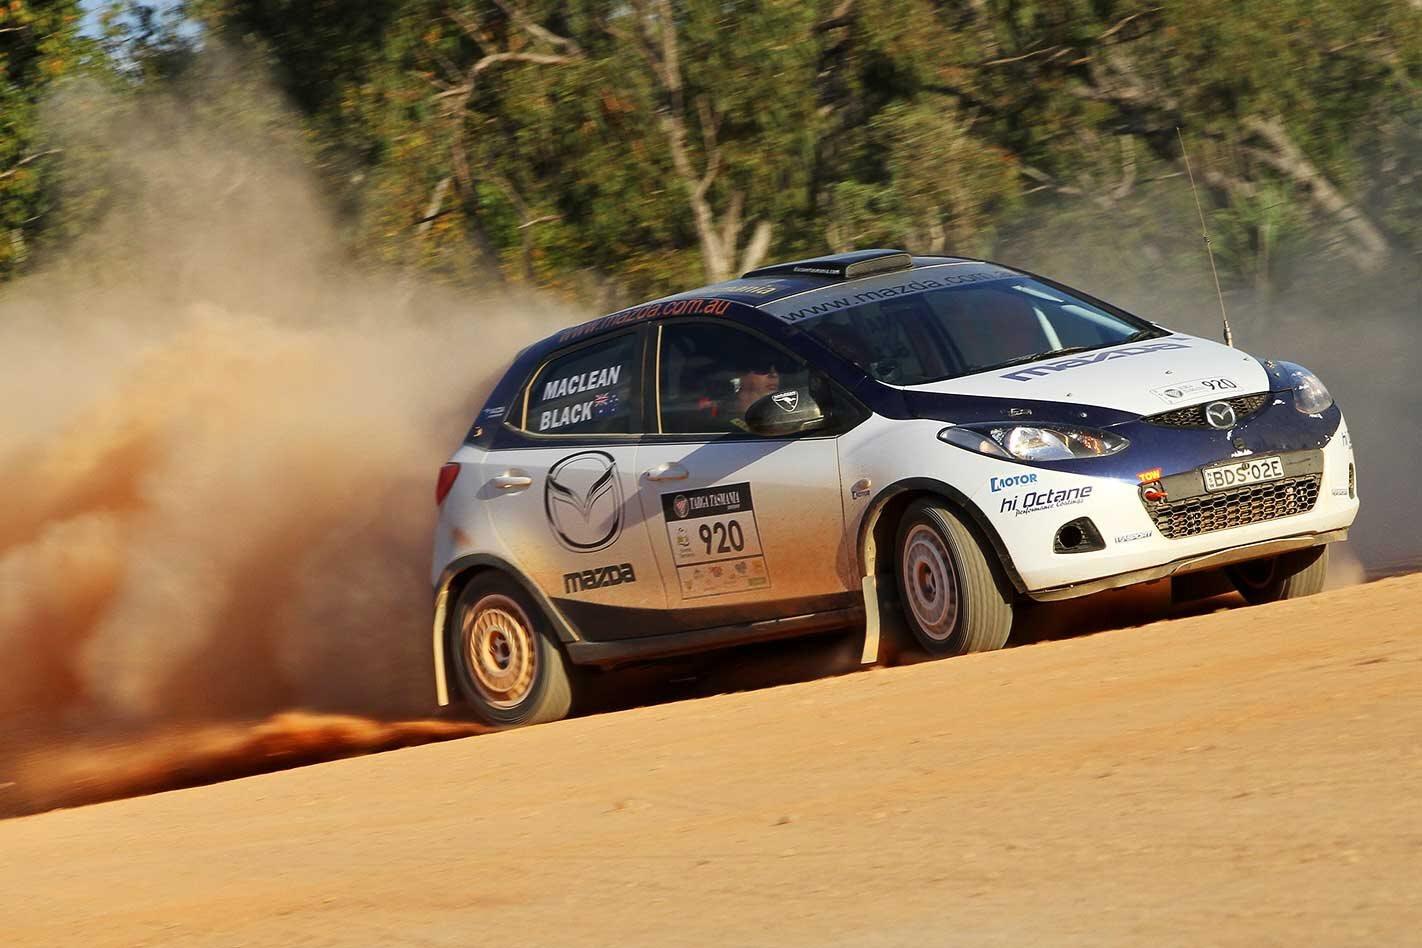 2012 Mazda 2 rally car review